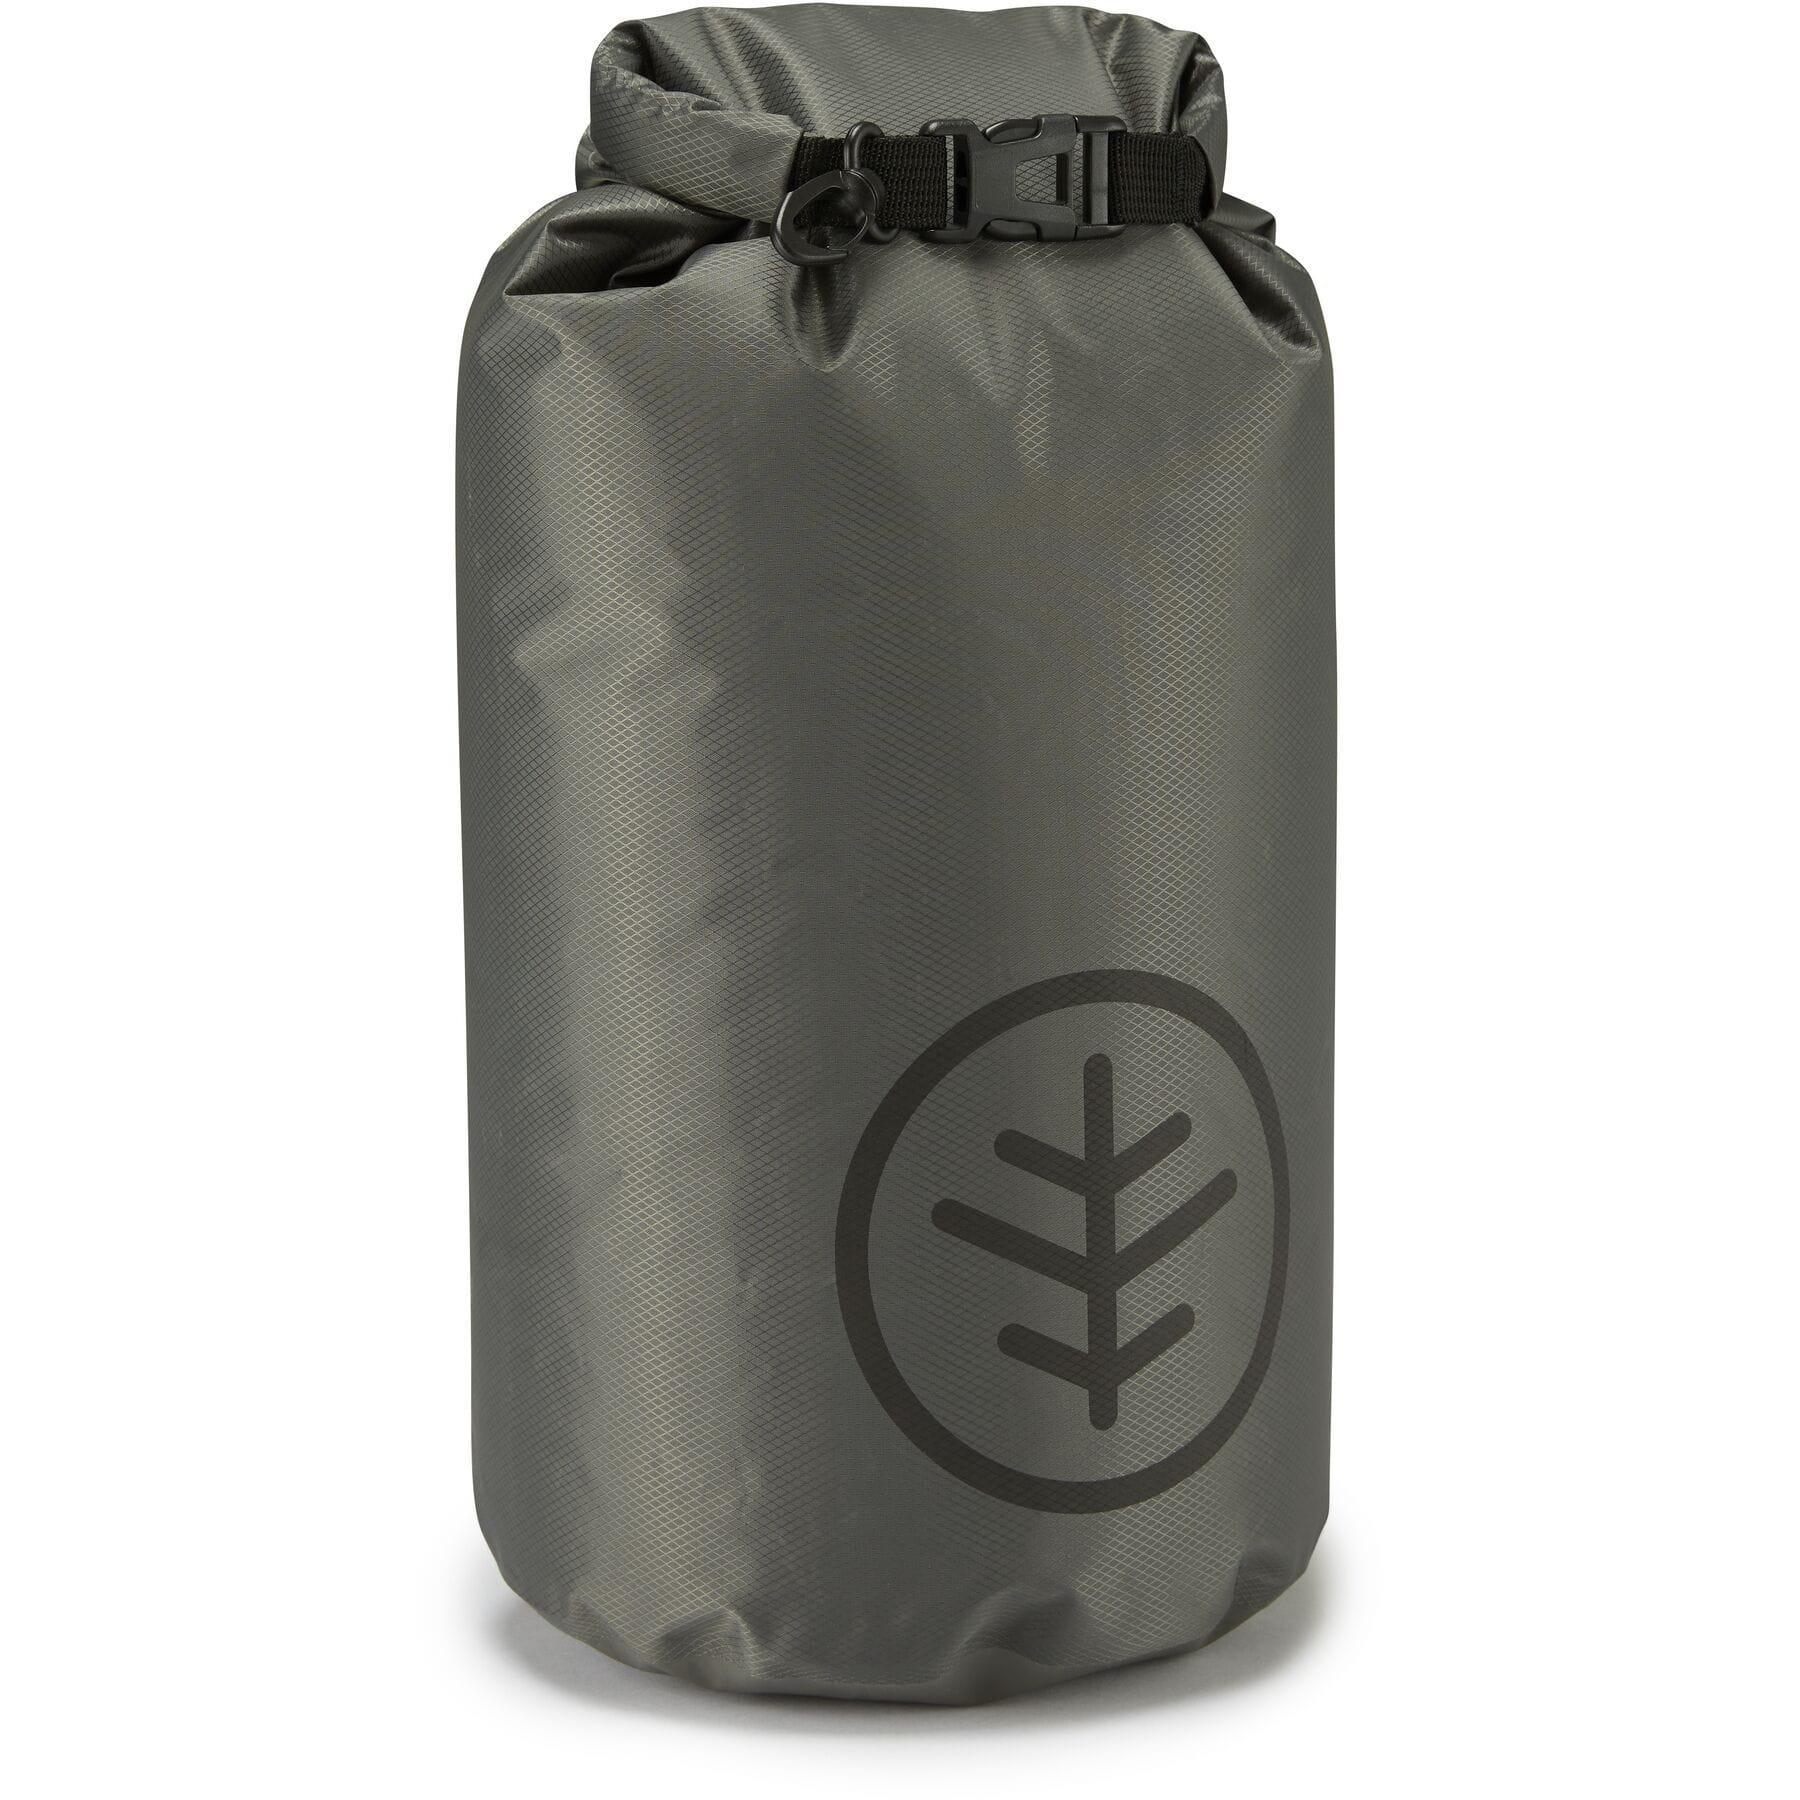 Vak Wychwood Dry Bag 10ltr